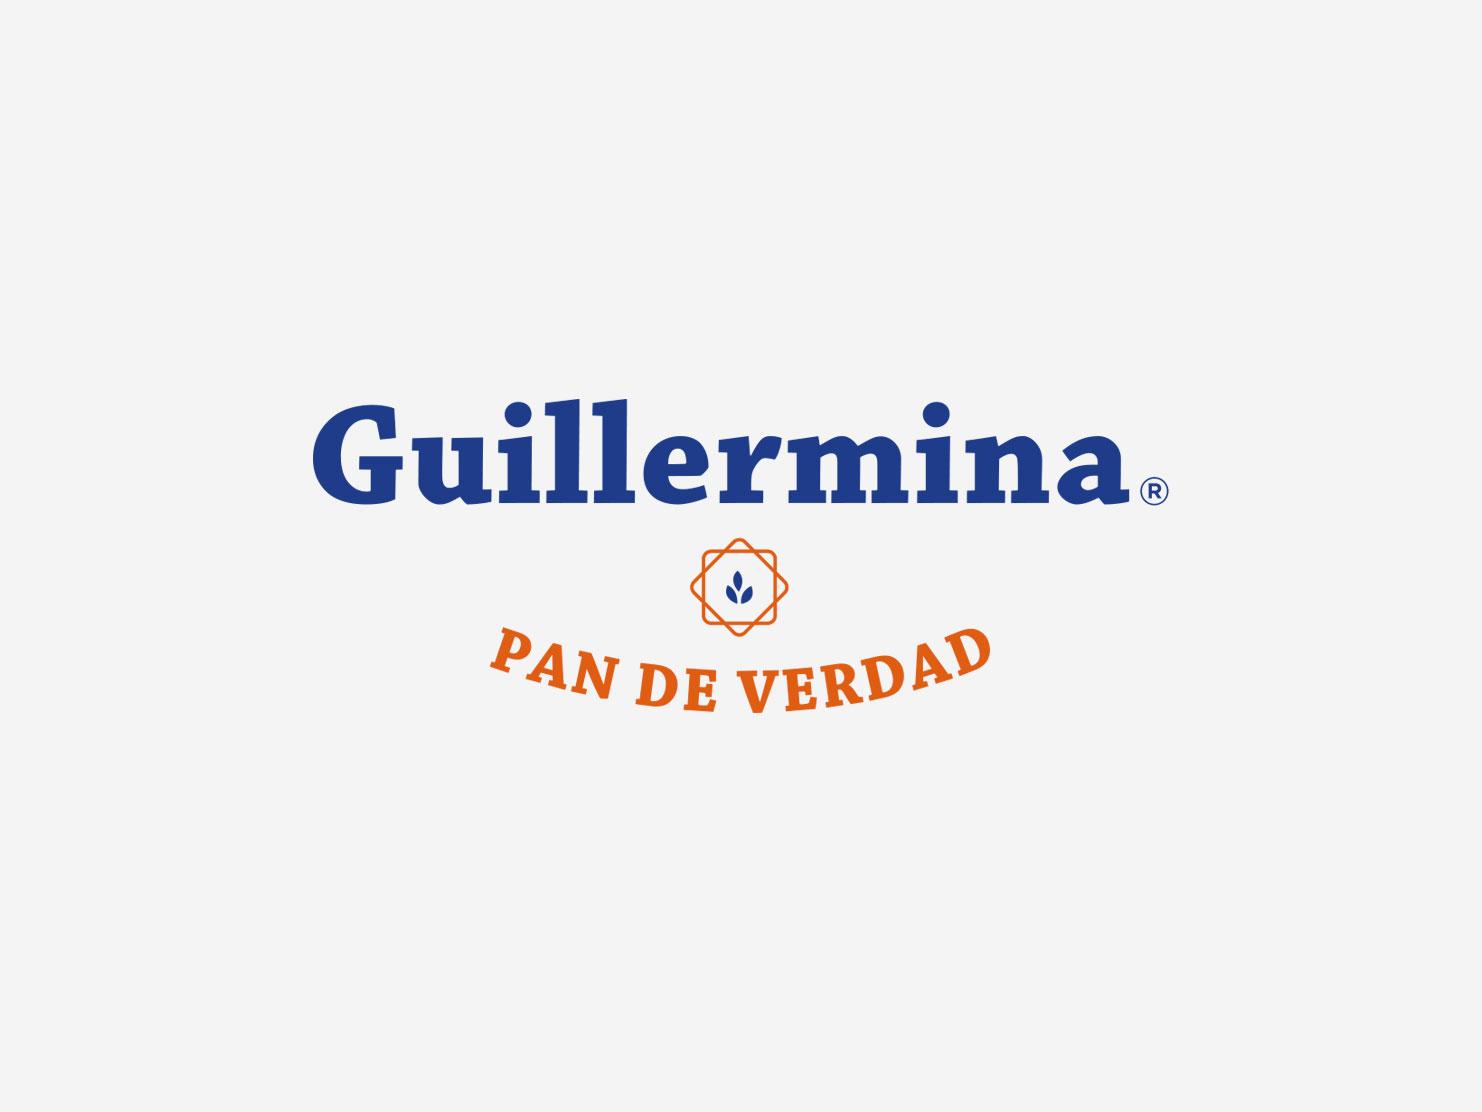 01guillermina-1